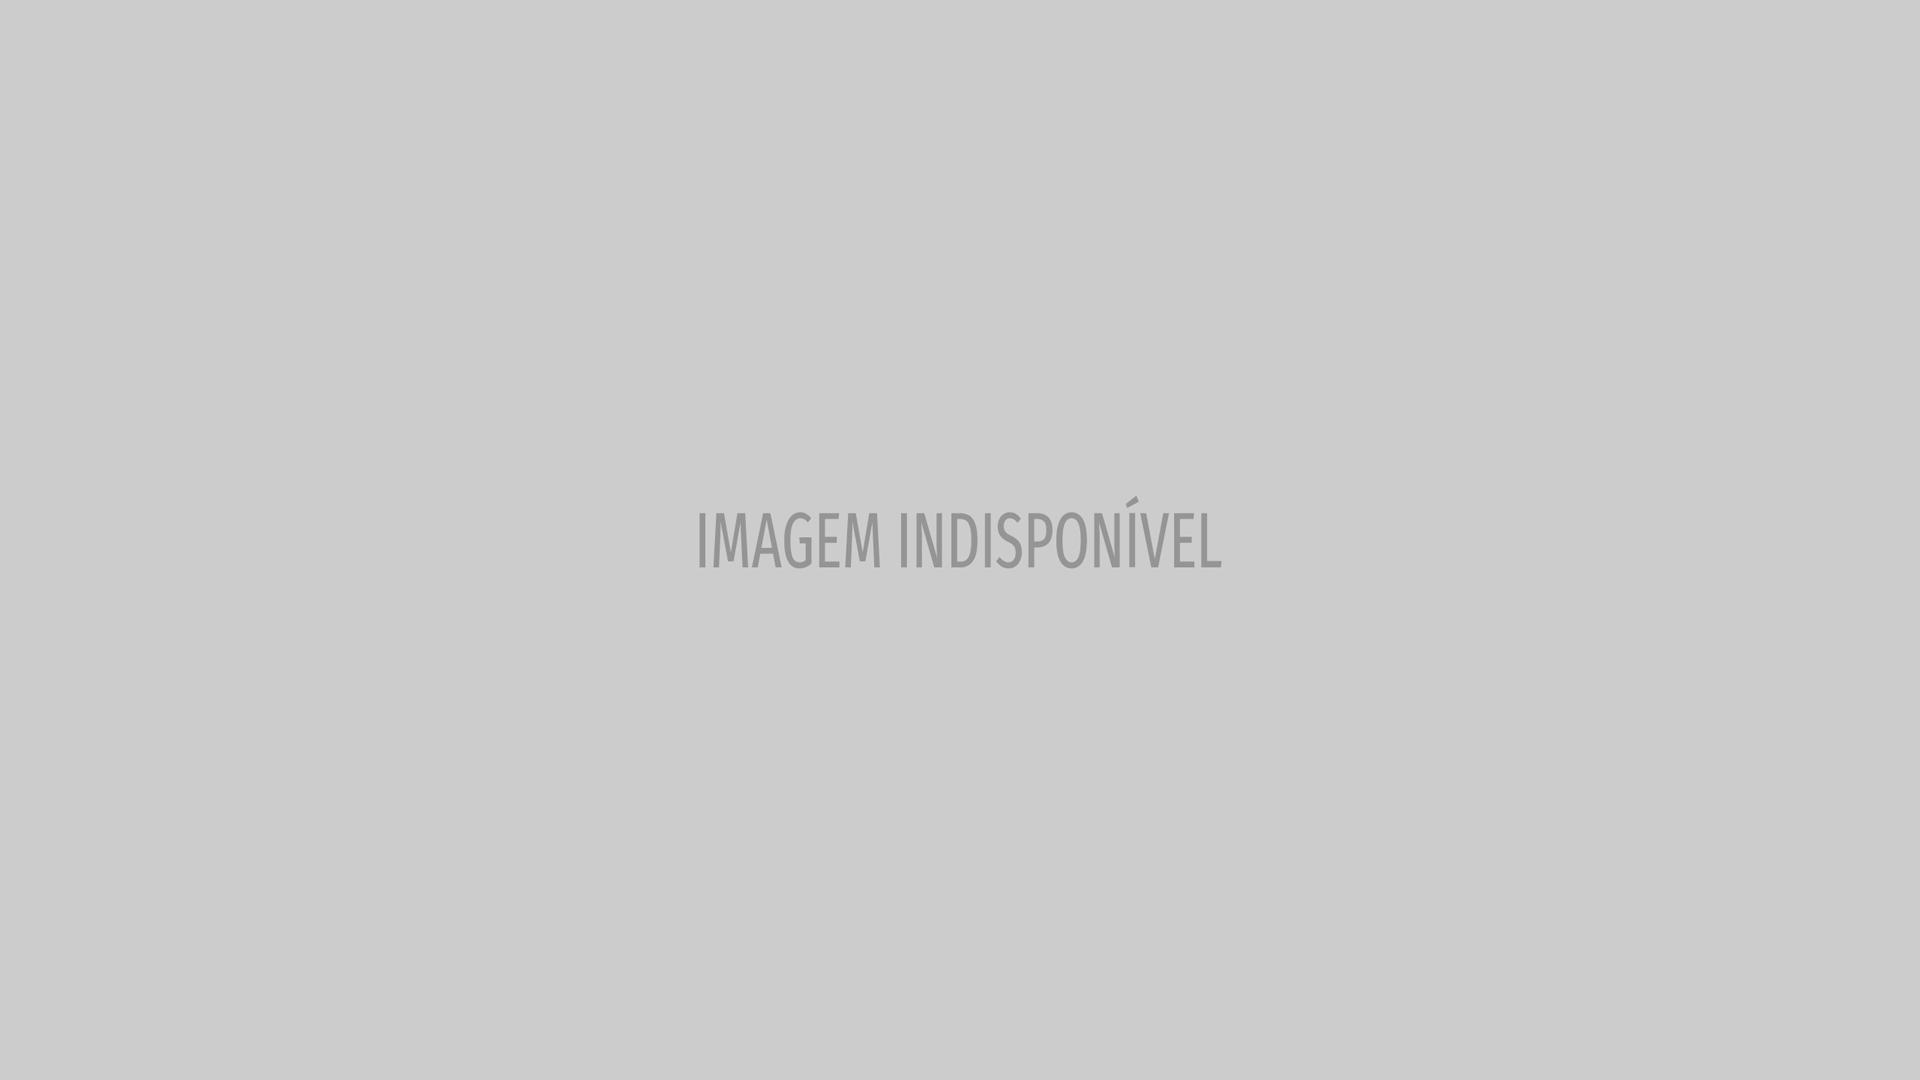 Sasha comenta foto de Bruno Montaleone: 'Meu'